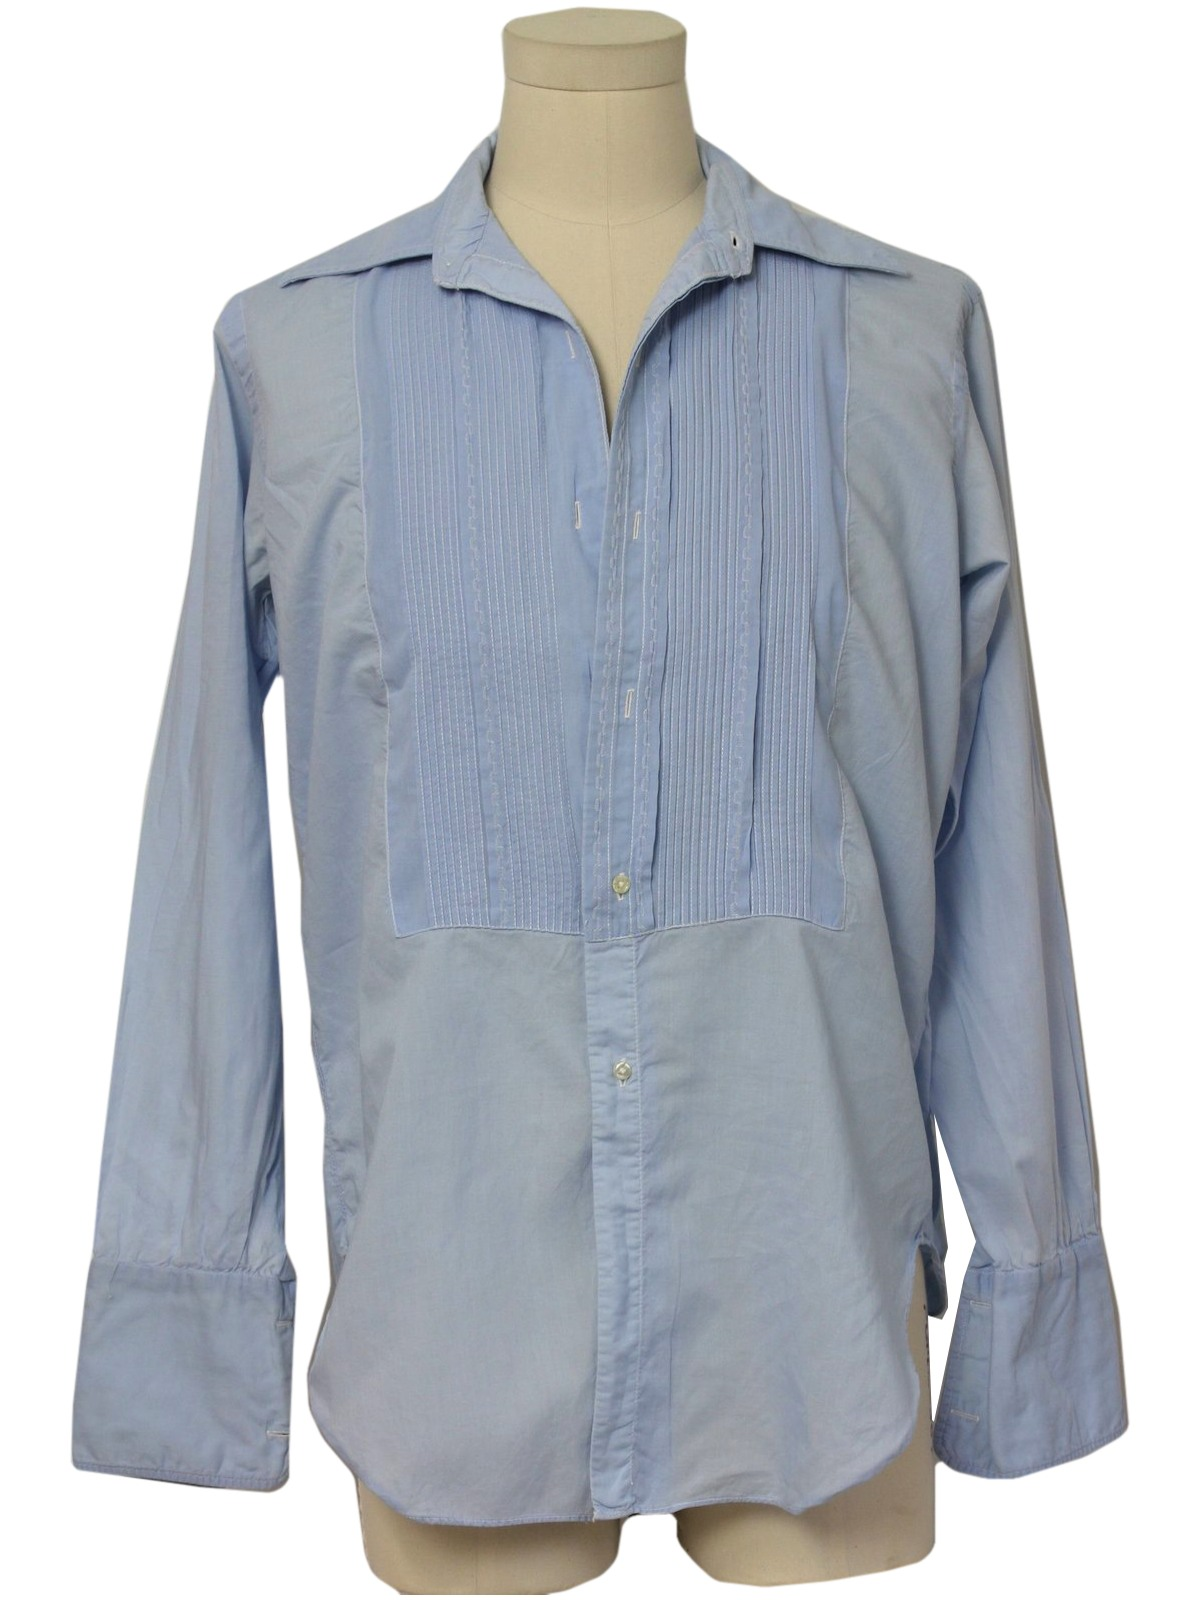 Badowers 70 39 s vintage shirt 70s badowers mens light sky for Mens dress shirts with cufflink holes